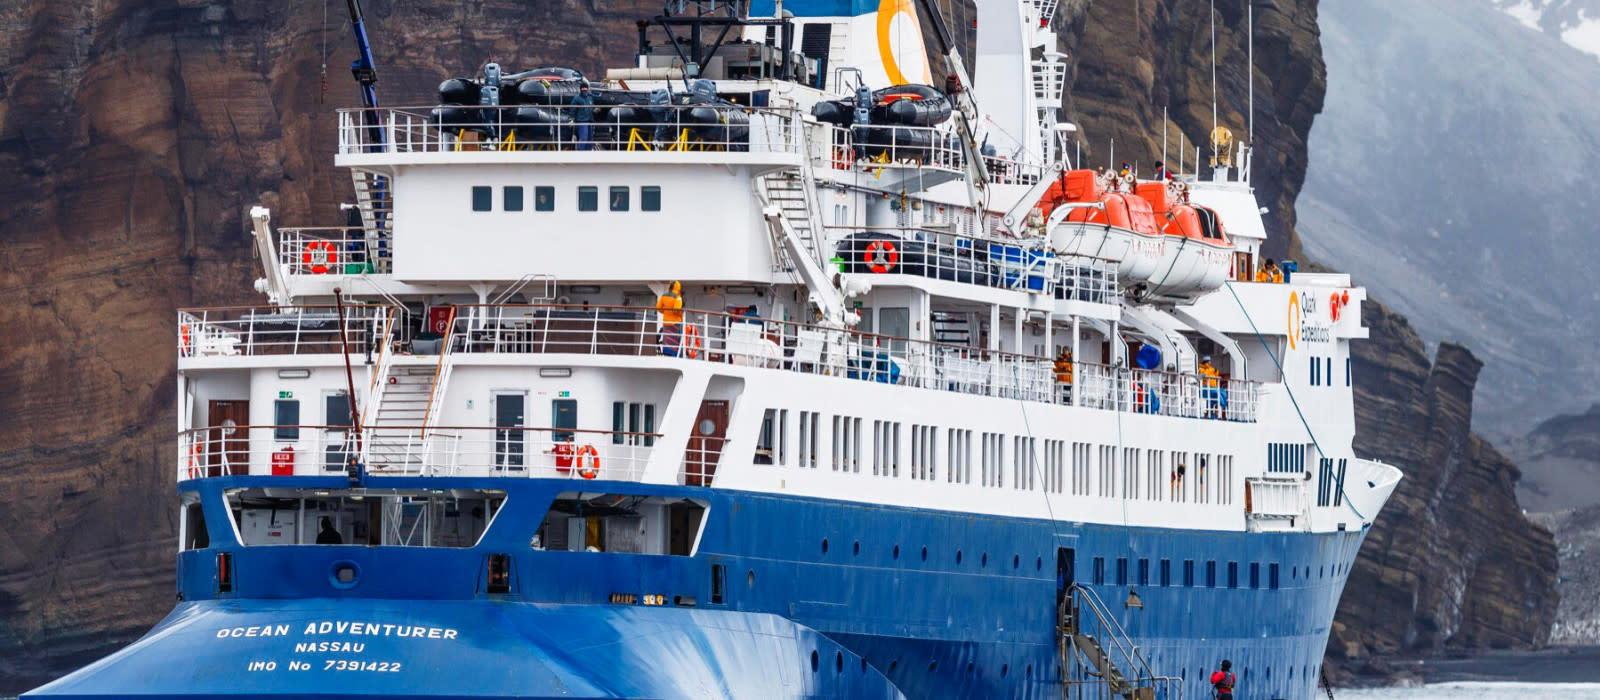 Hotel Ocean Adventurer by Quark Expeditions, The Arctic Arctic